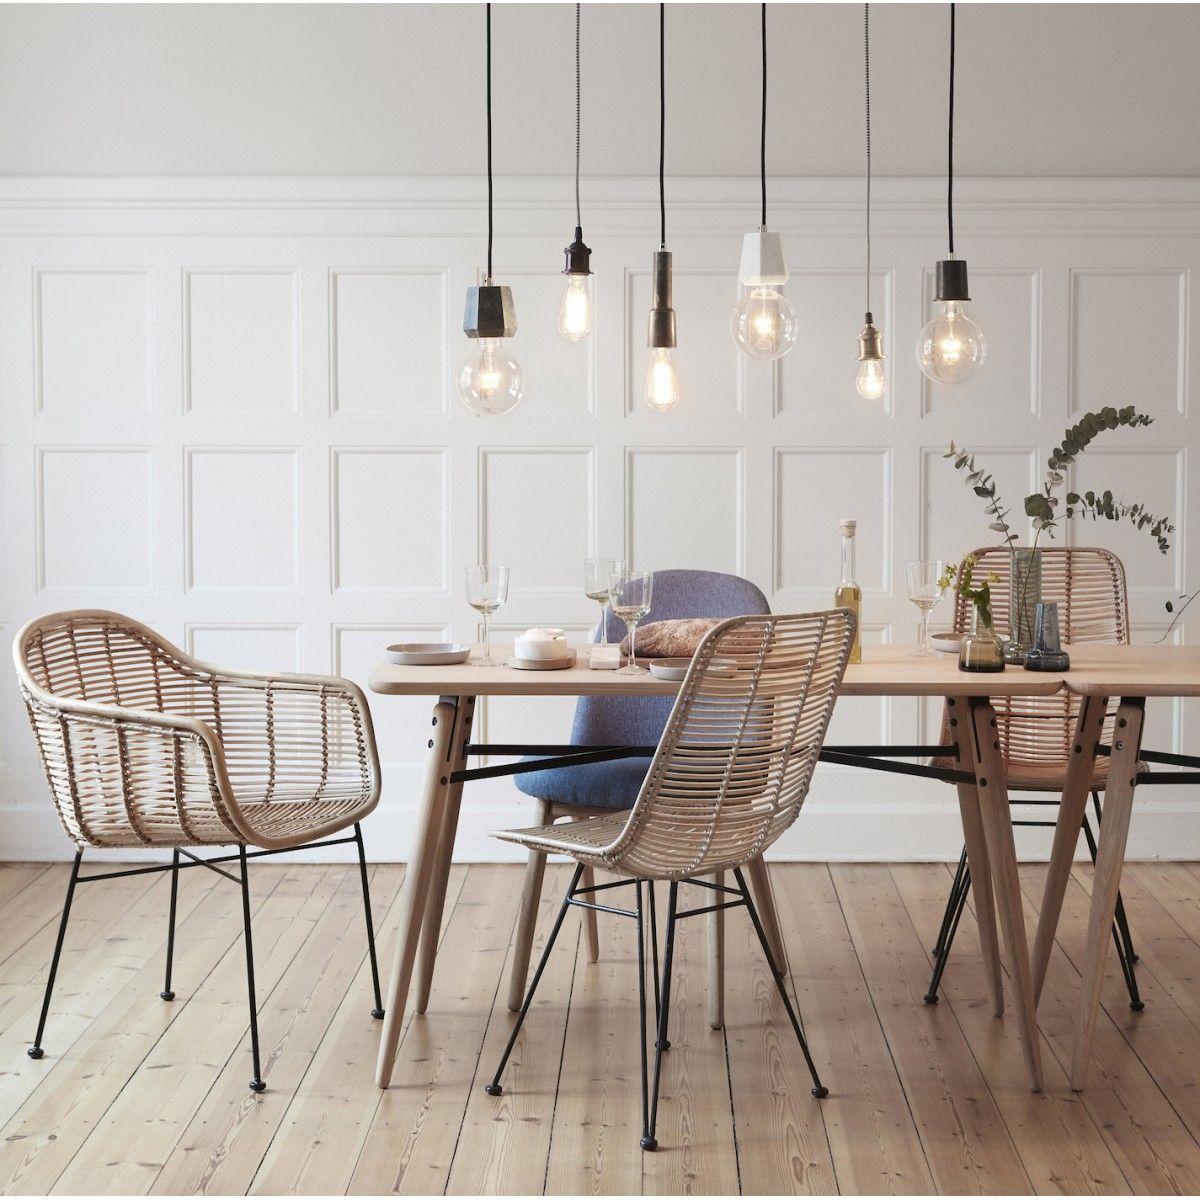 meuble design. chaise en rotin naturel avec accoudoirs